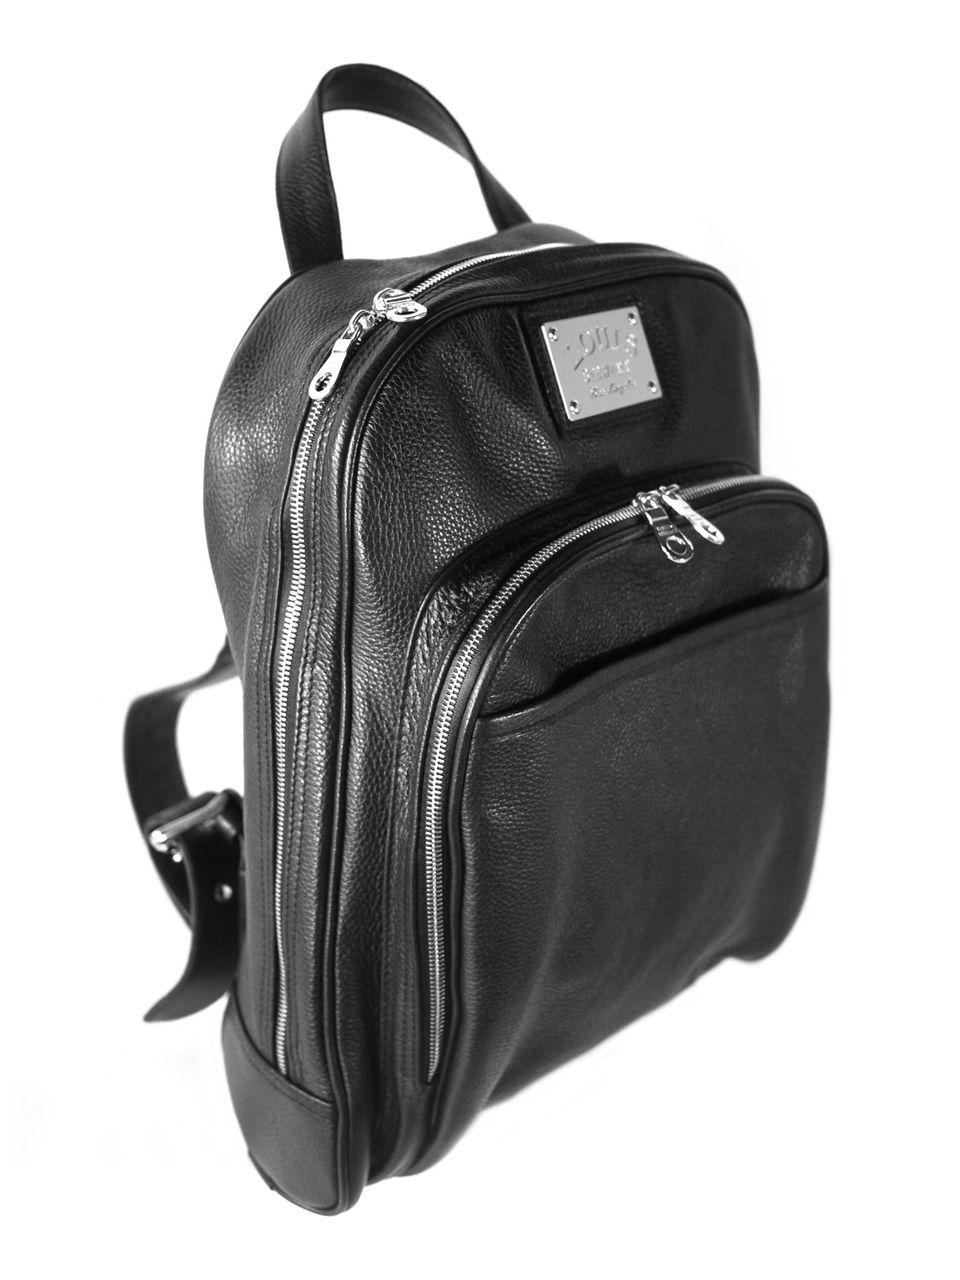 fbfc4c9d92 Louis Stewart Black Leather Original Backpack - Louis Stewart Collection